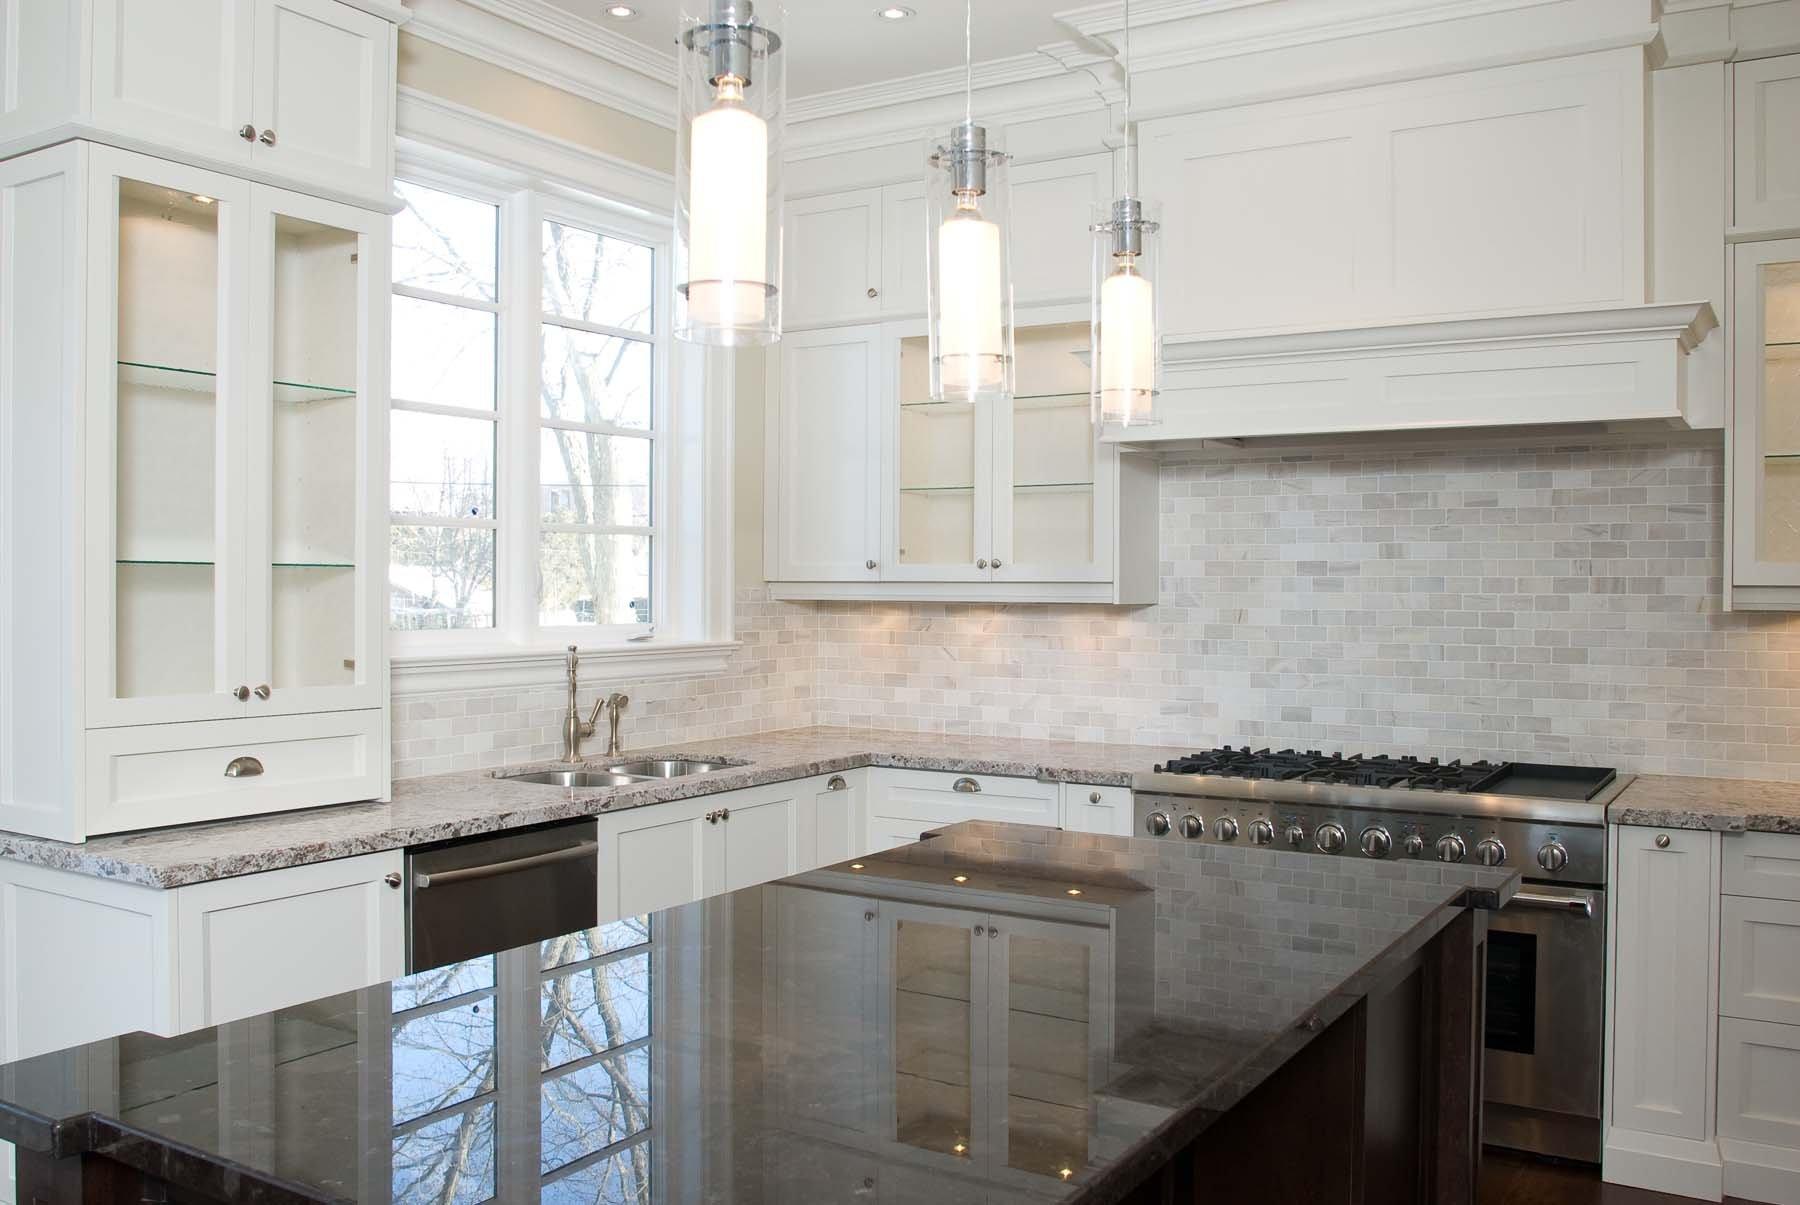 White kitchen backsplash.